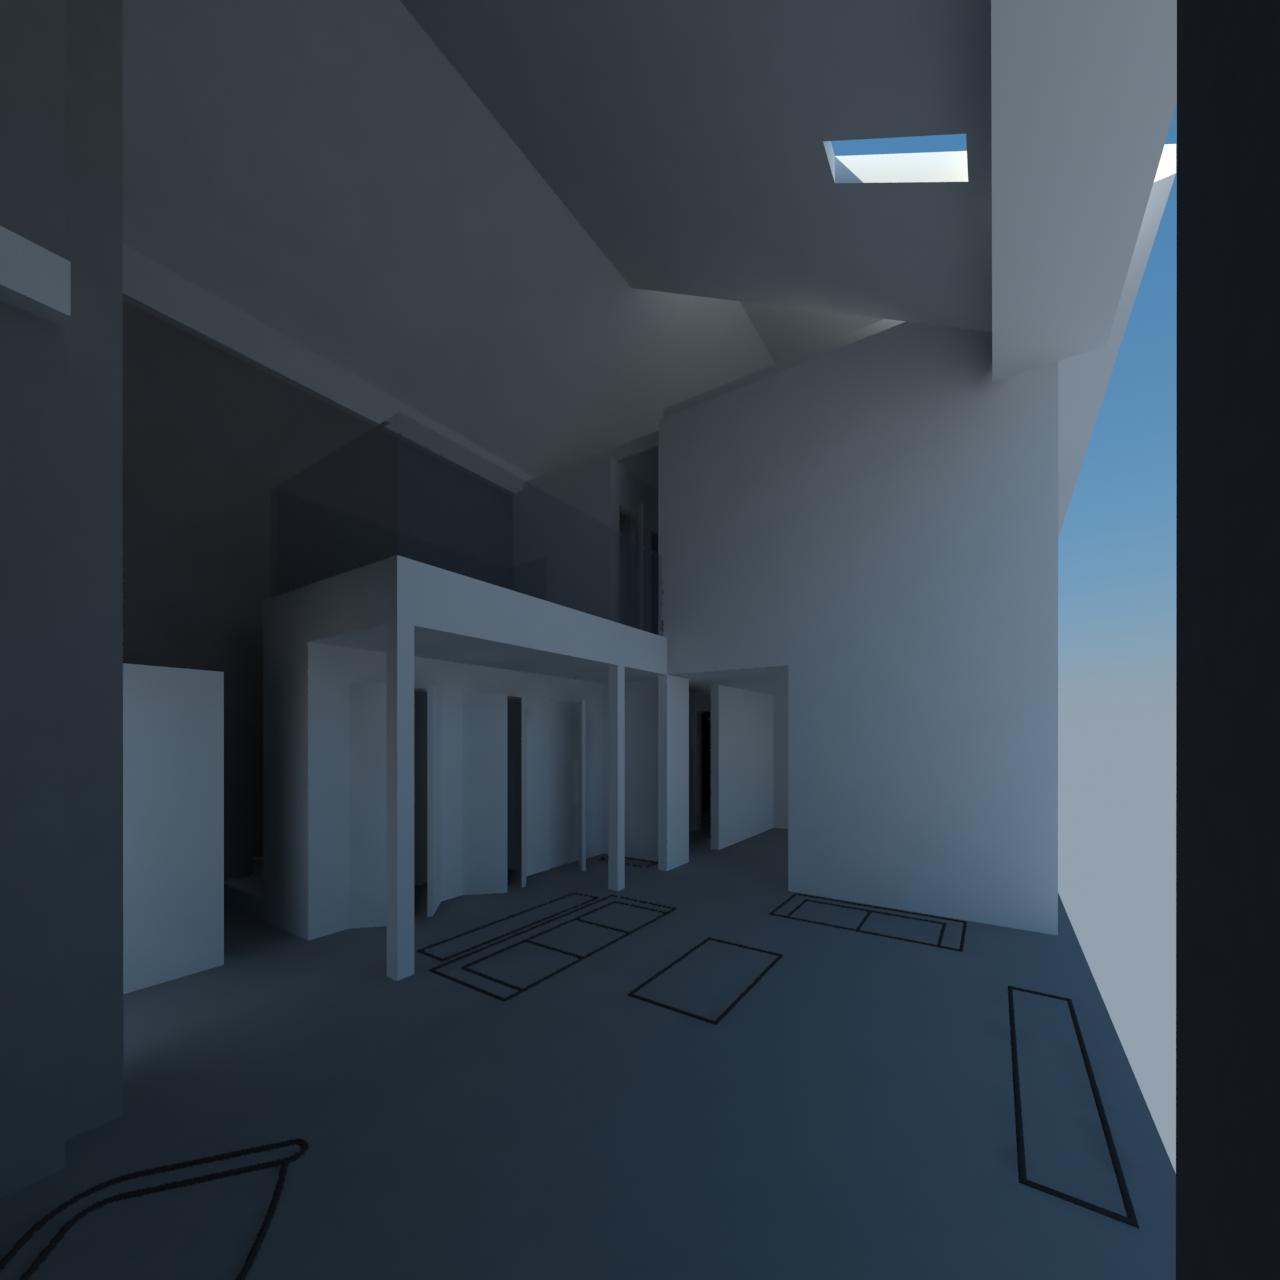 Lvg_Room_01